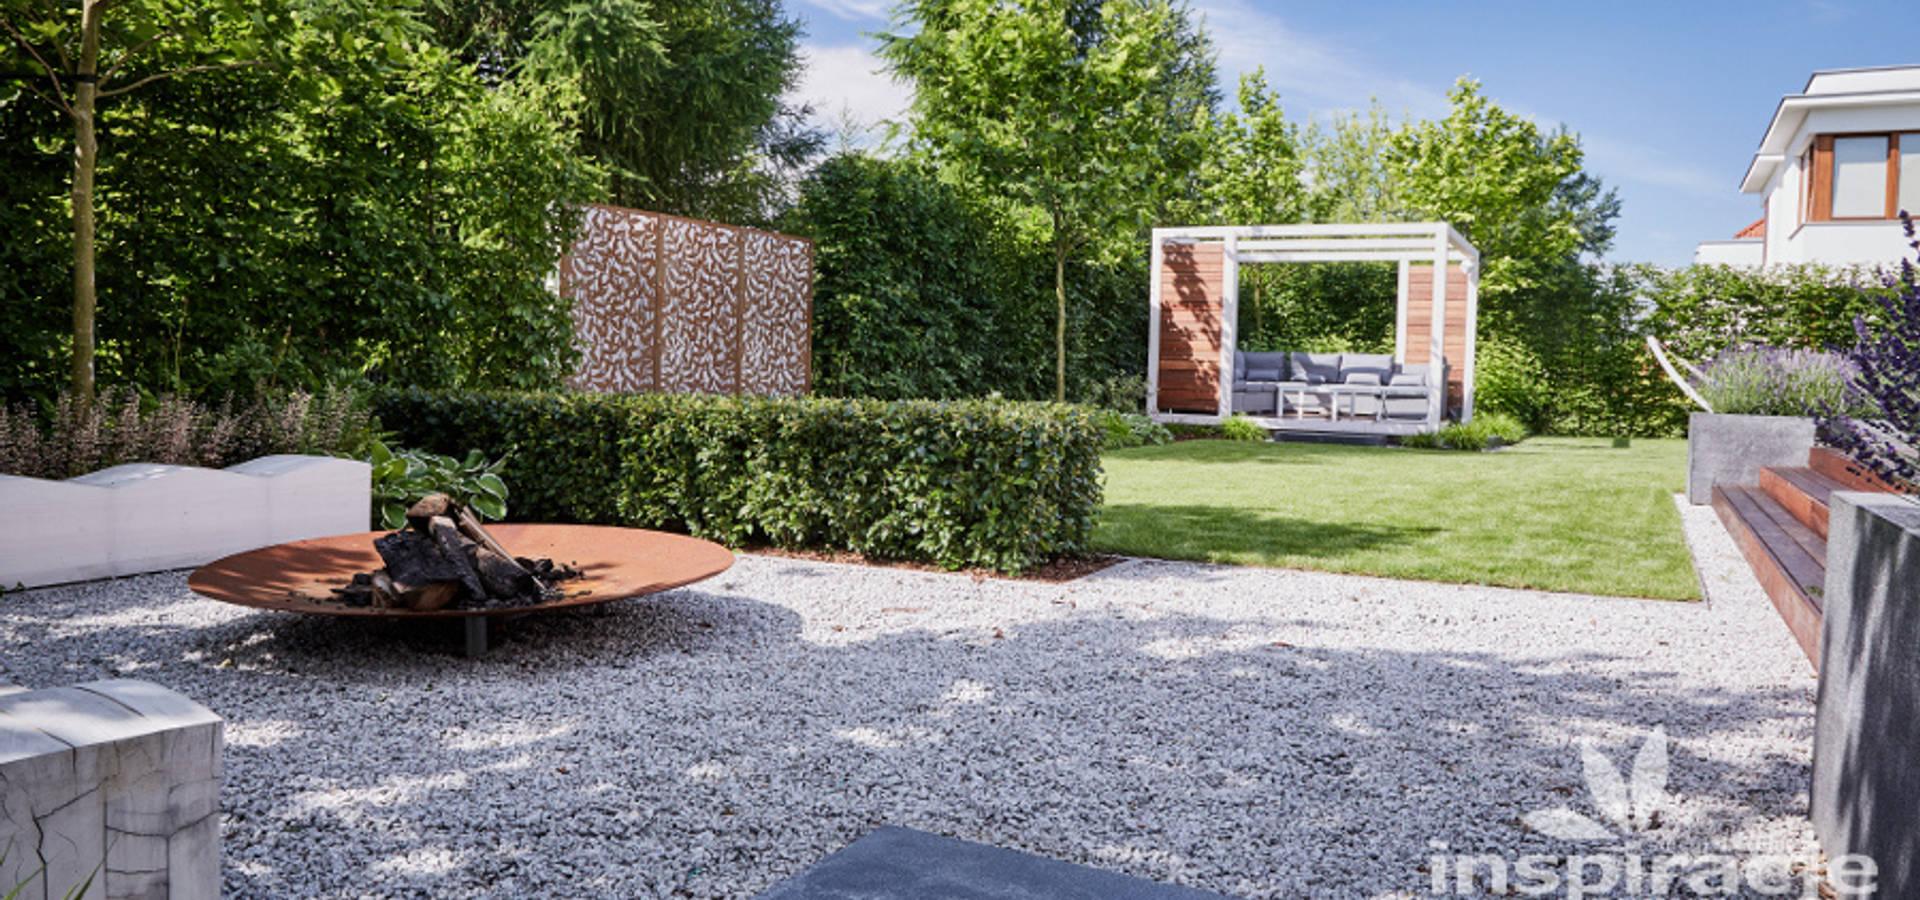 Studio architektury krajobrazu INSPIRACJE